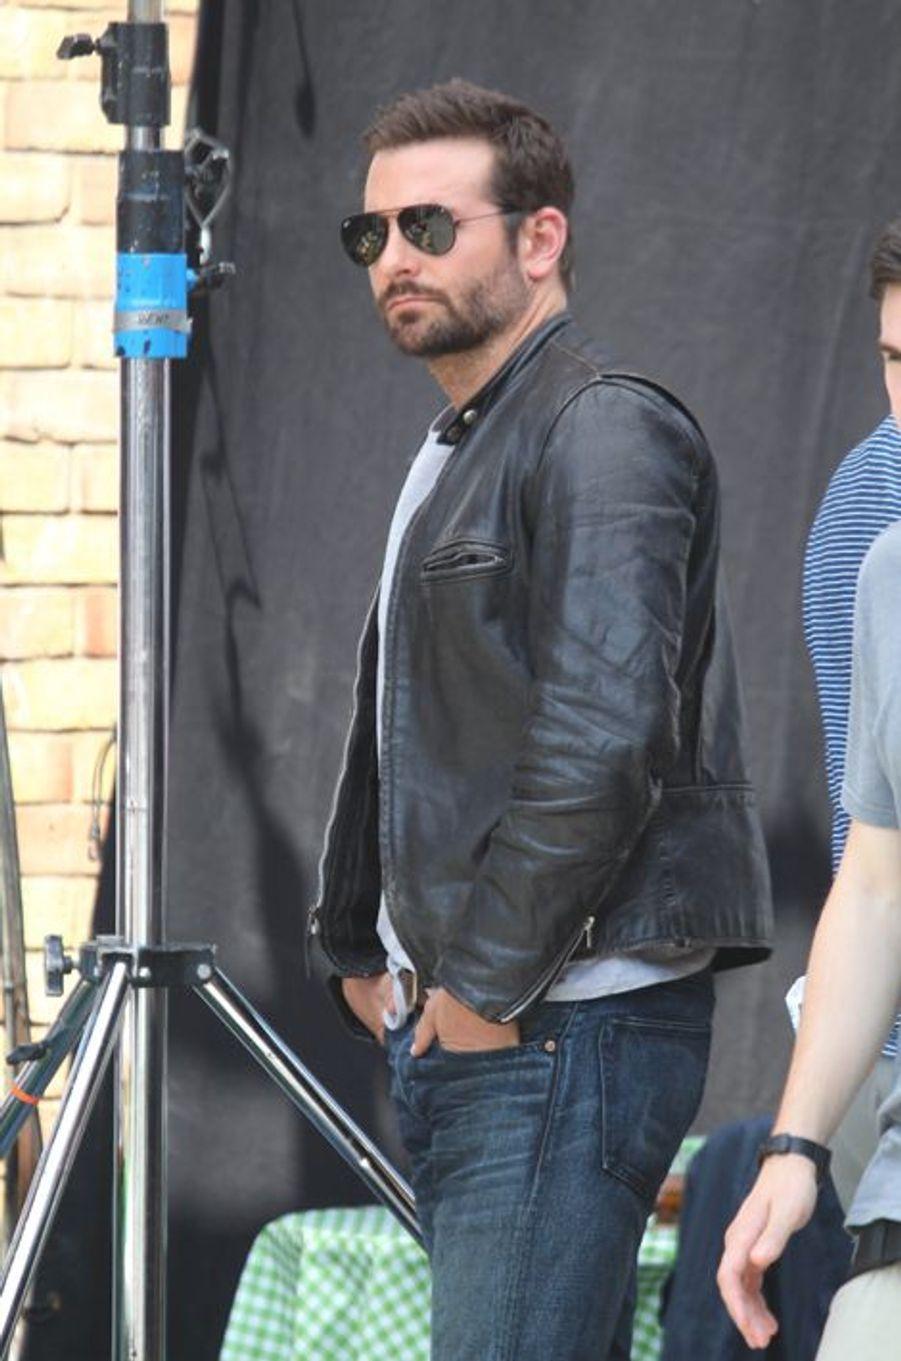 Bradley Cooper en tournage à Londres, le 30 juillet 2014